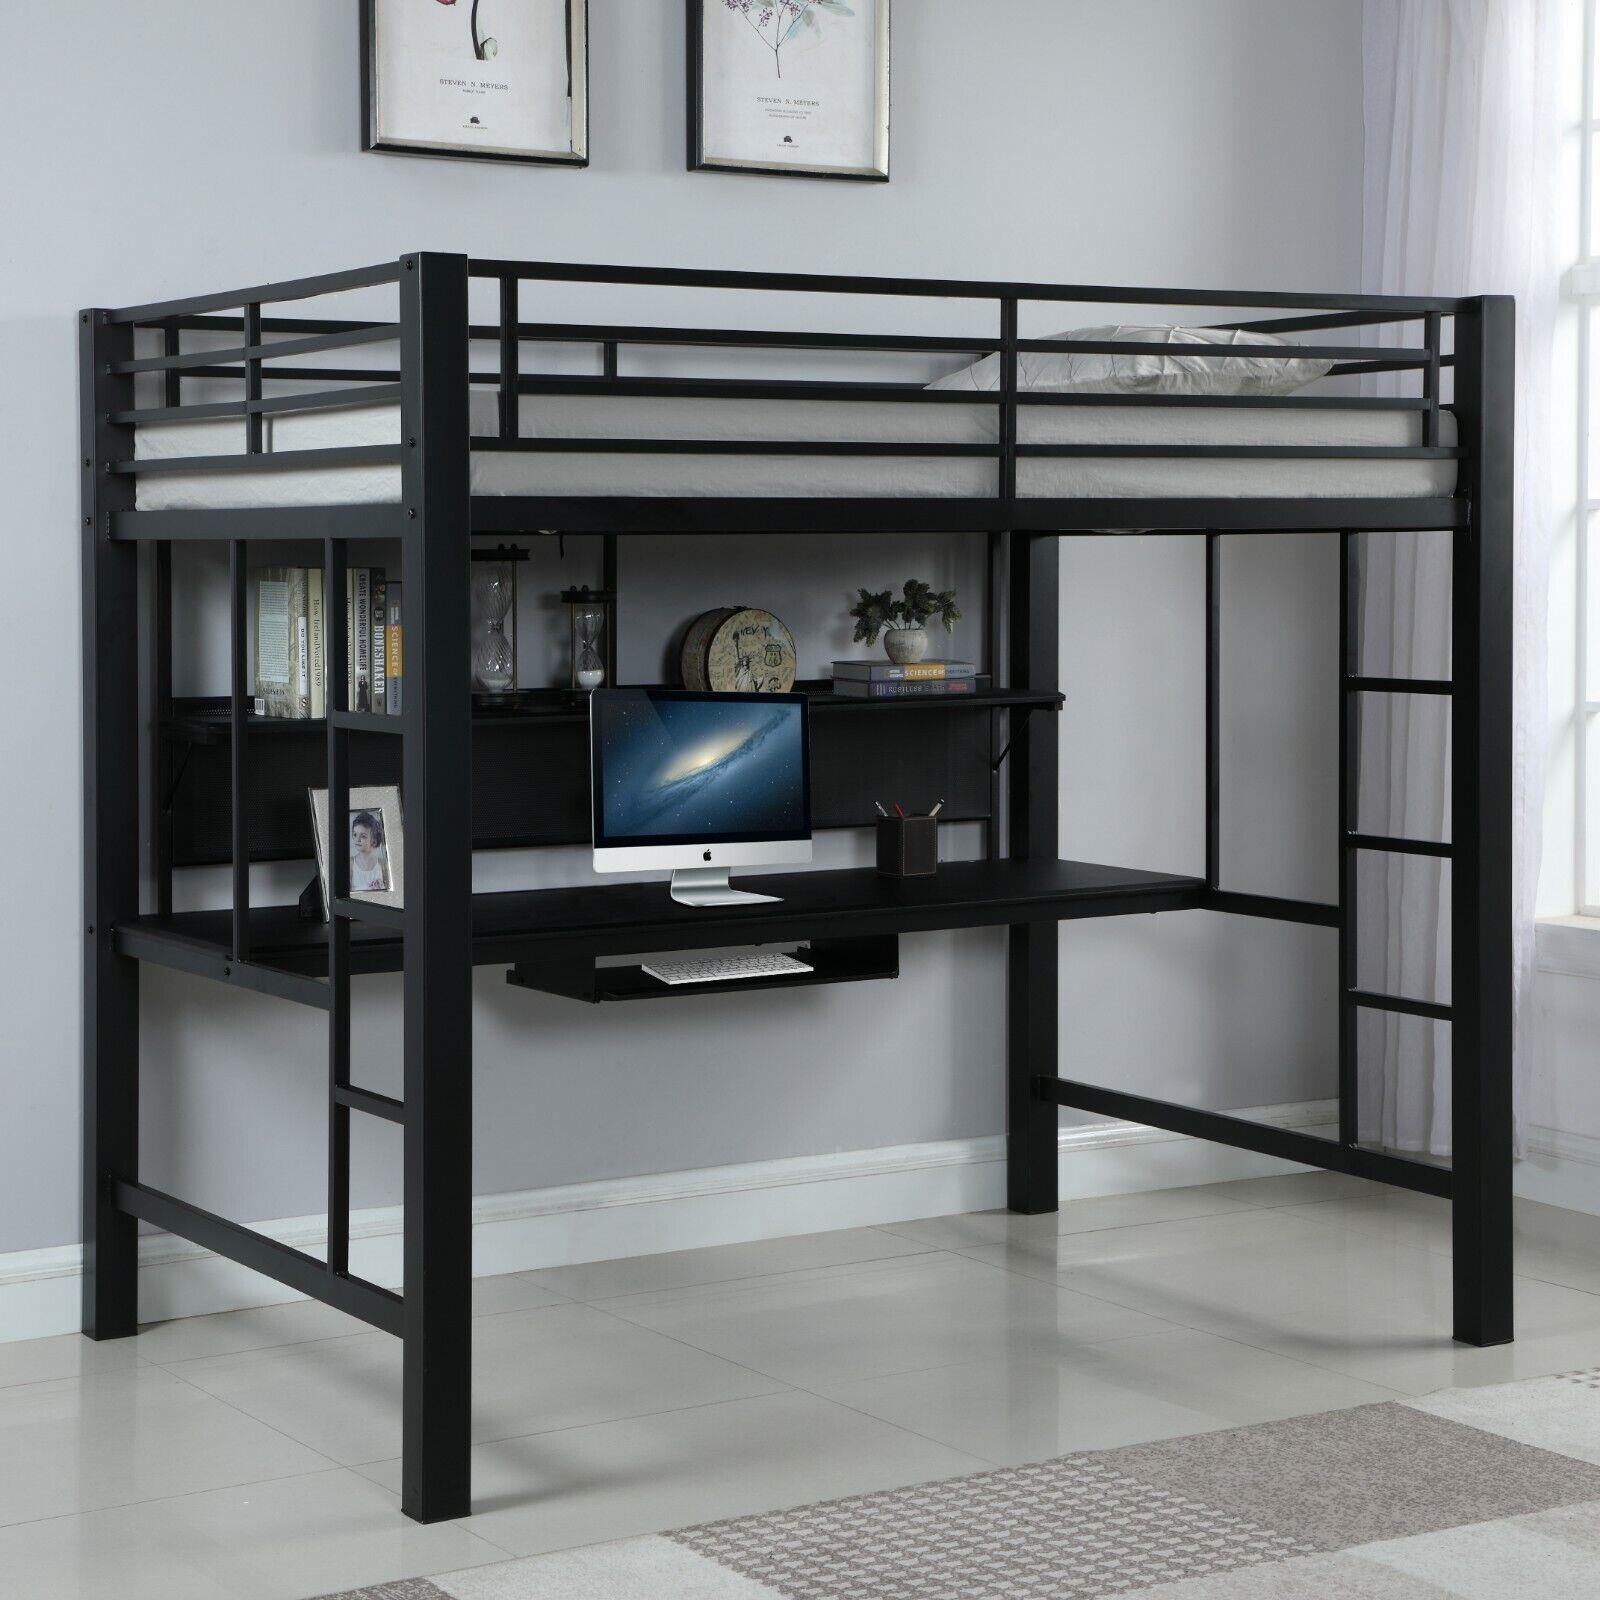 Modern Adult & Teen Heavy Duty Metal Workstation Loft Bunk Bed Full Size - Black